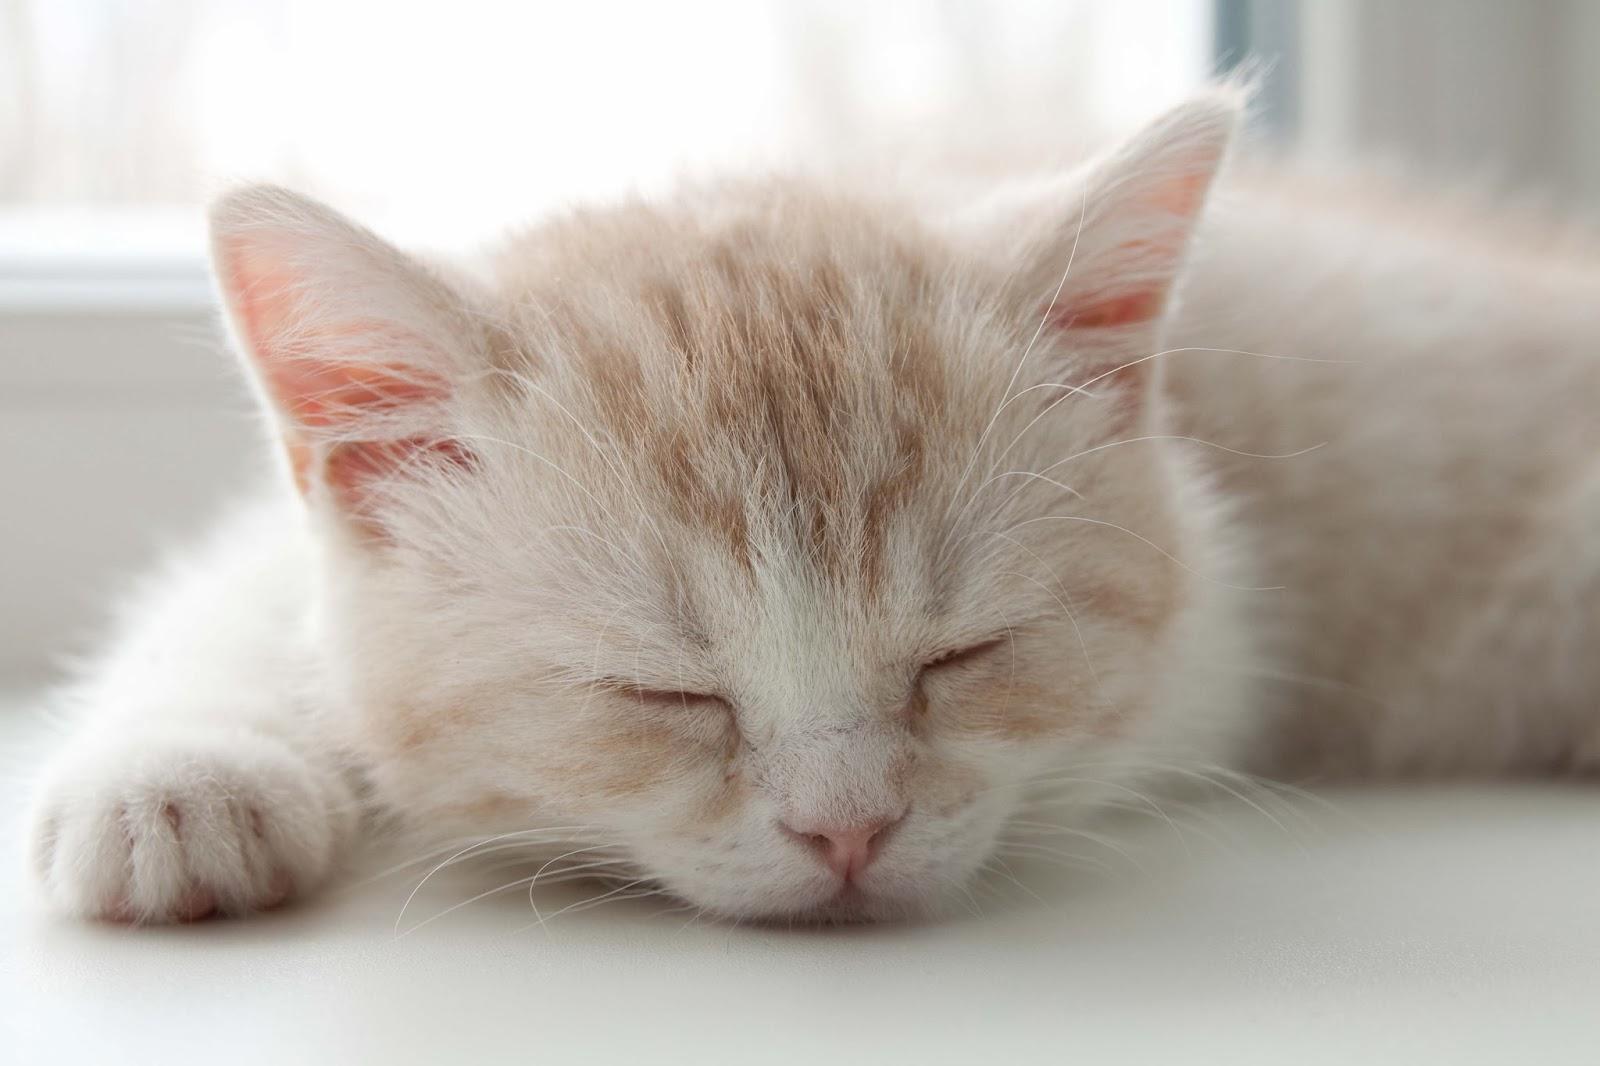 cute cats sleep wallpaper - photo #38